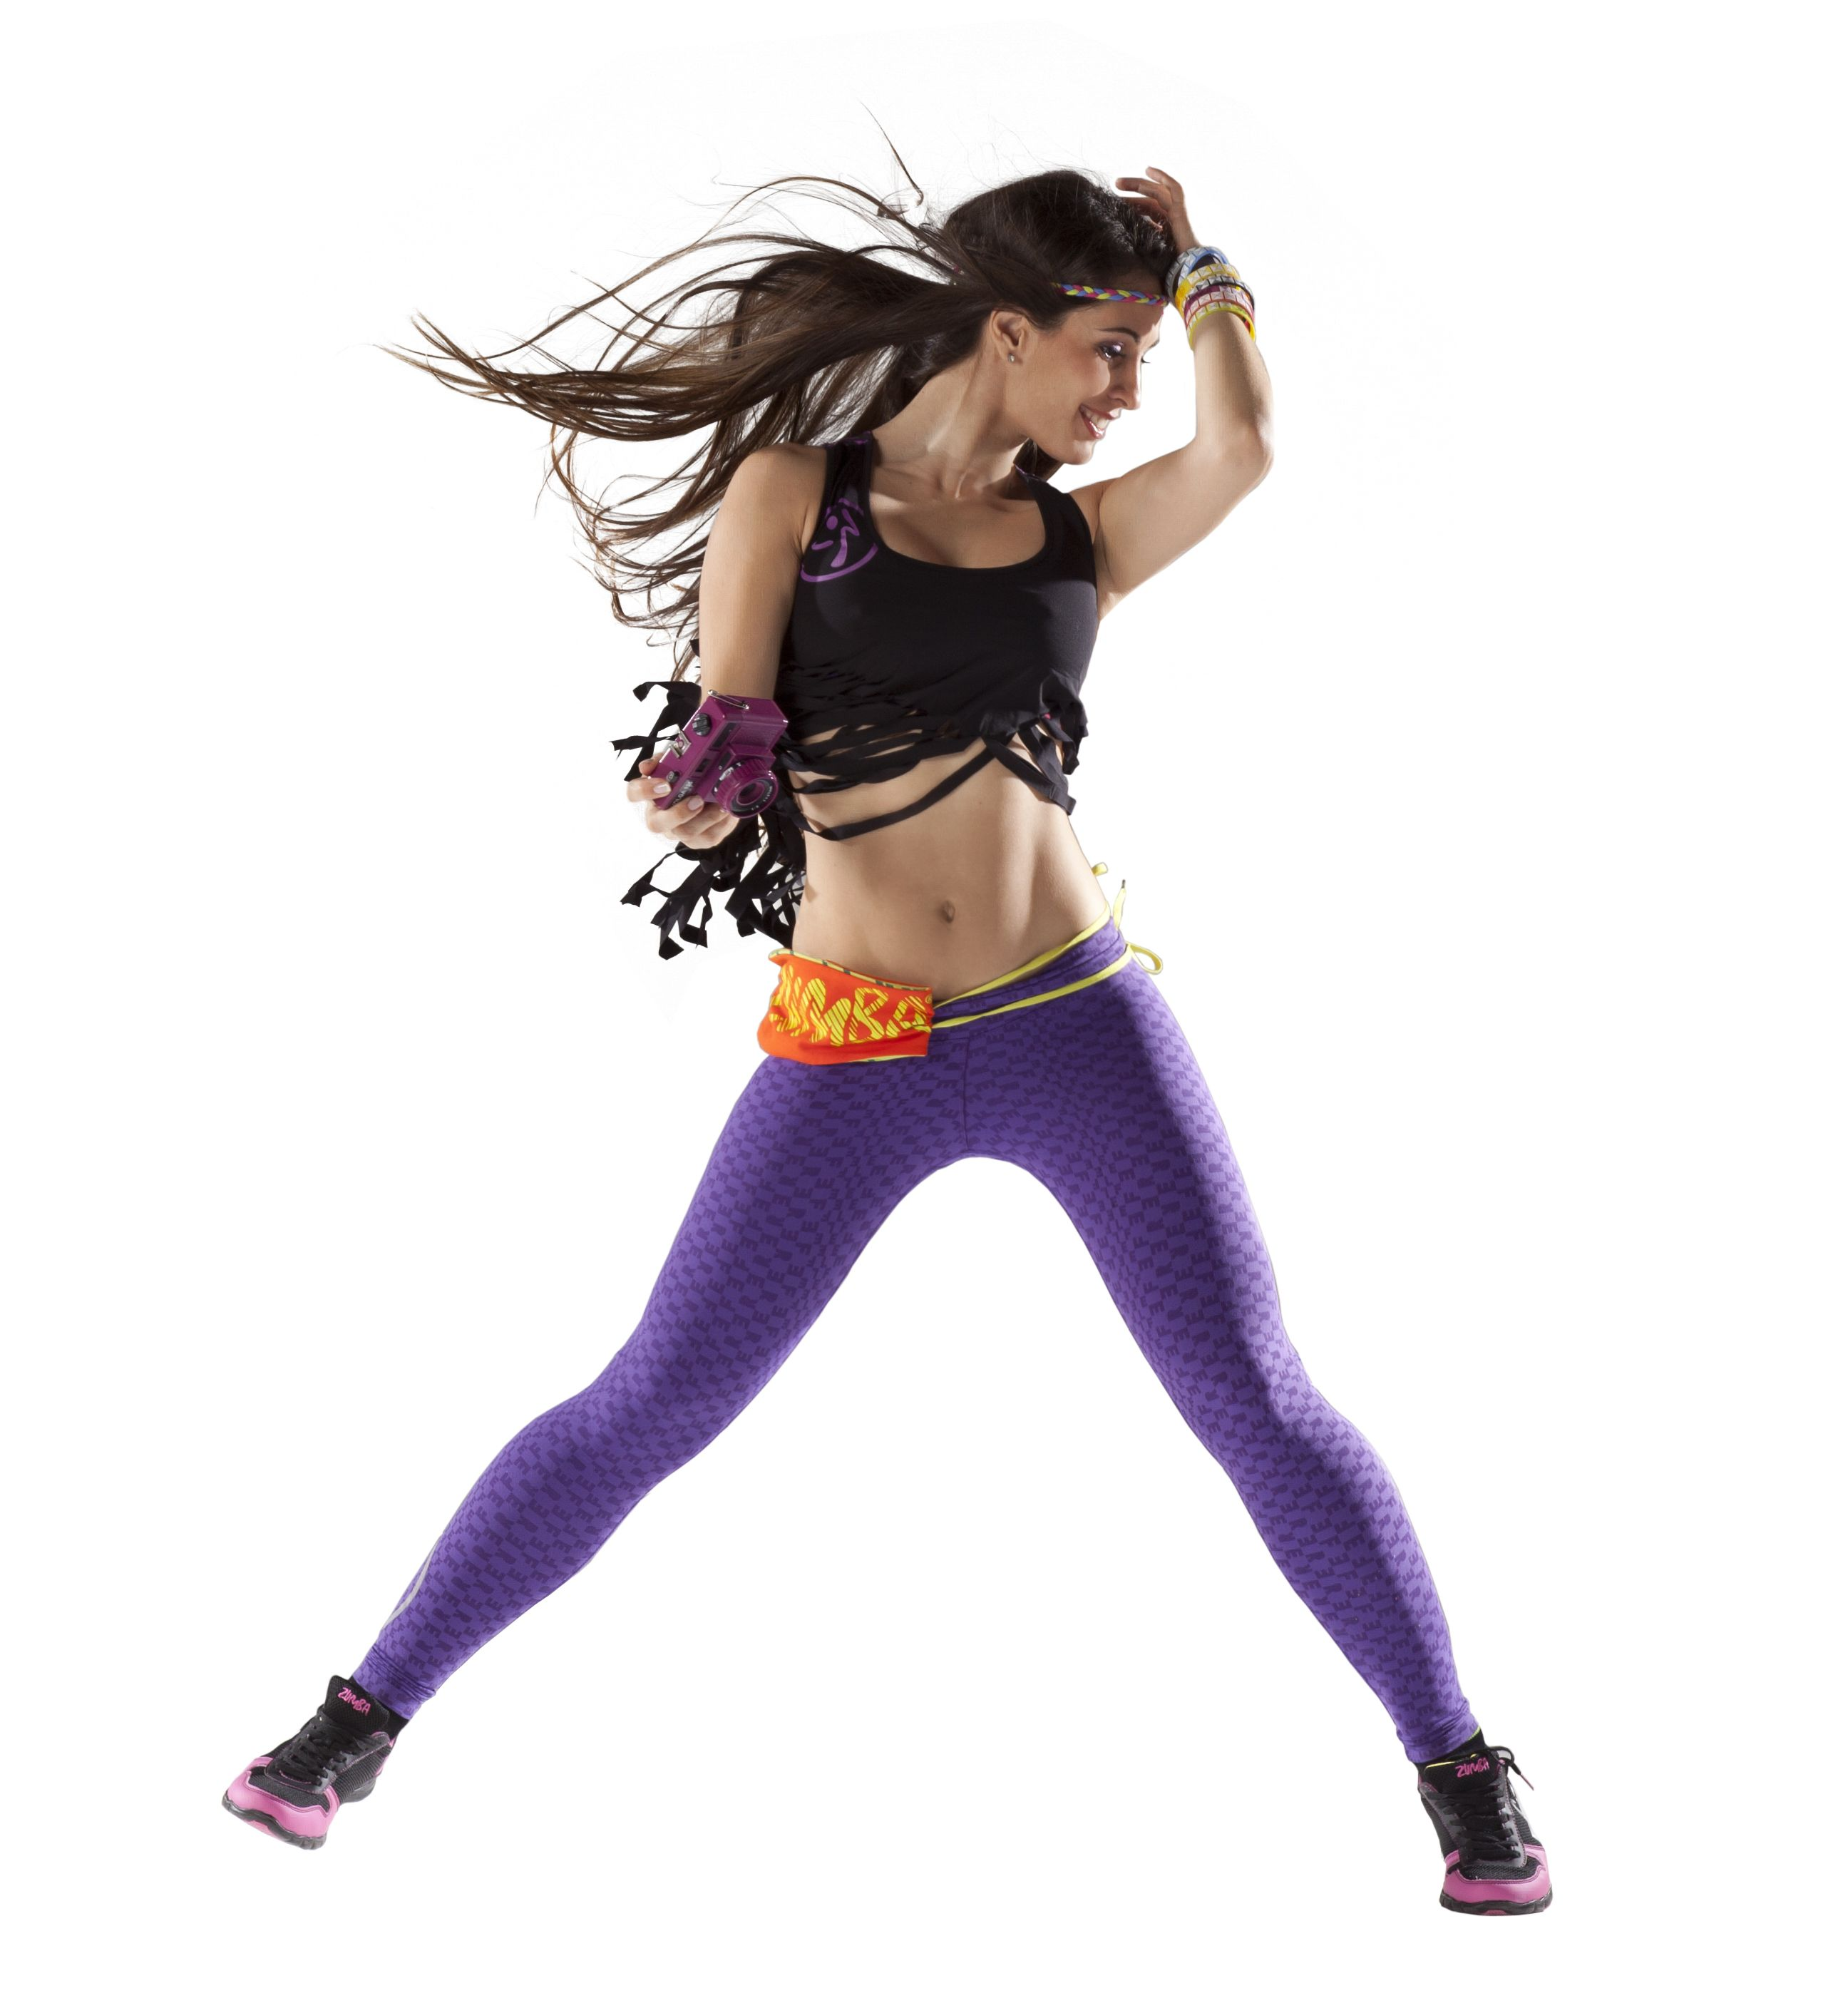 girls-dancing-girlsponr-stagette-needs